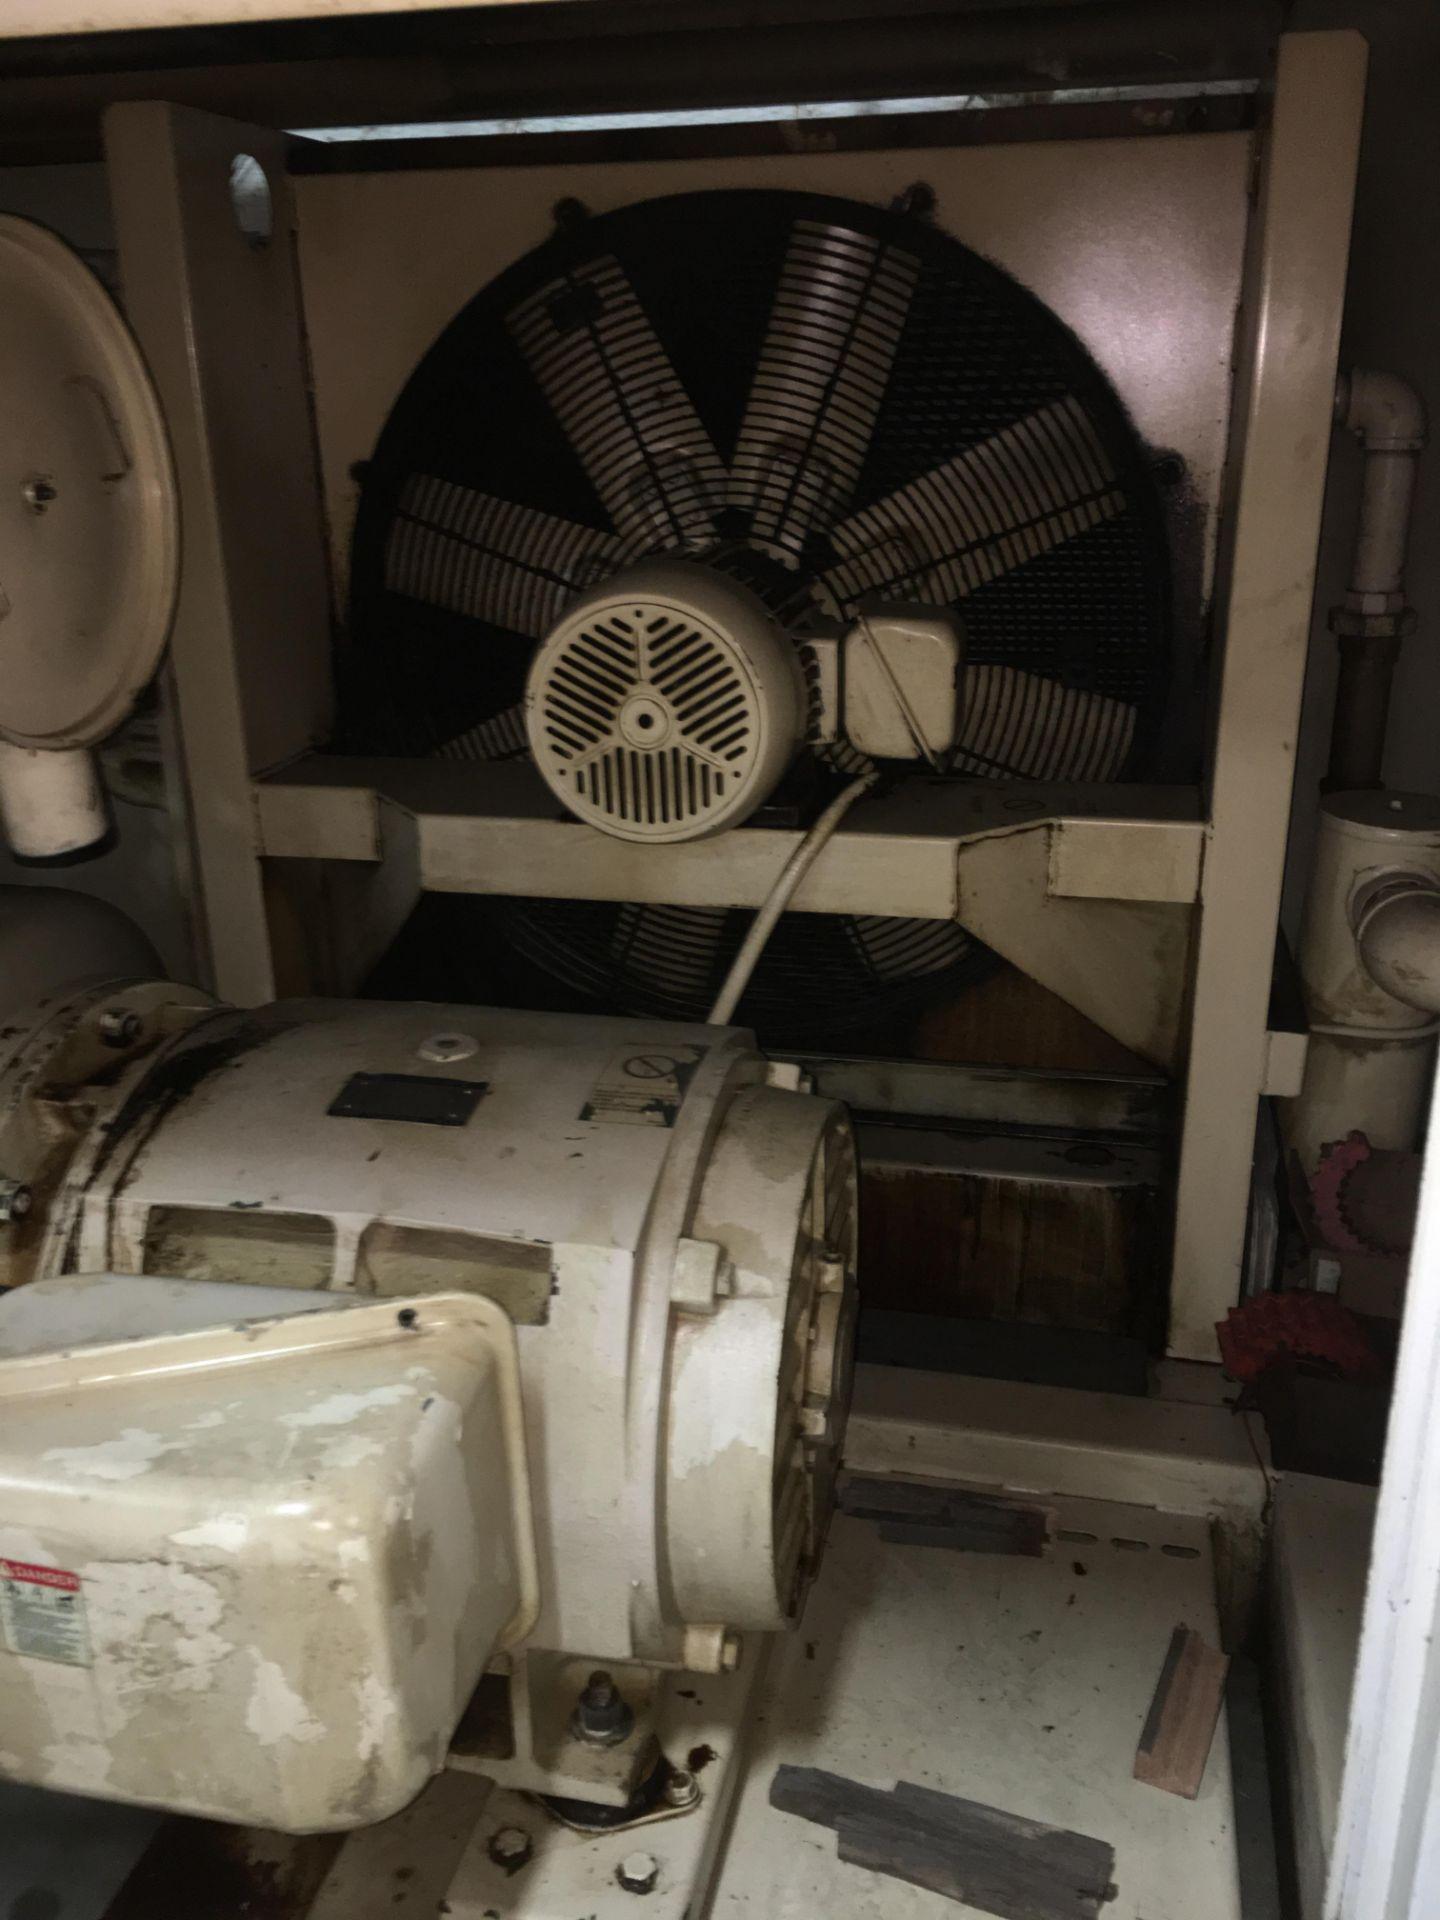 Lot 29 - GARDNER DENVER ELECTRA SAVER 125-HP AIR COMPRESSOR; YEAR 2008, 200-PSI, S/N: S040390, *FREE LOADING